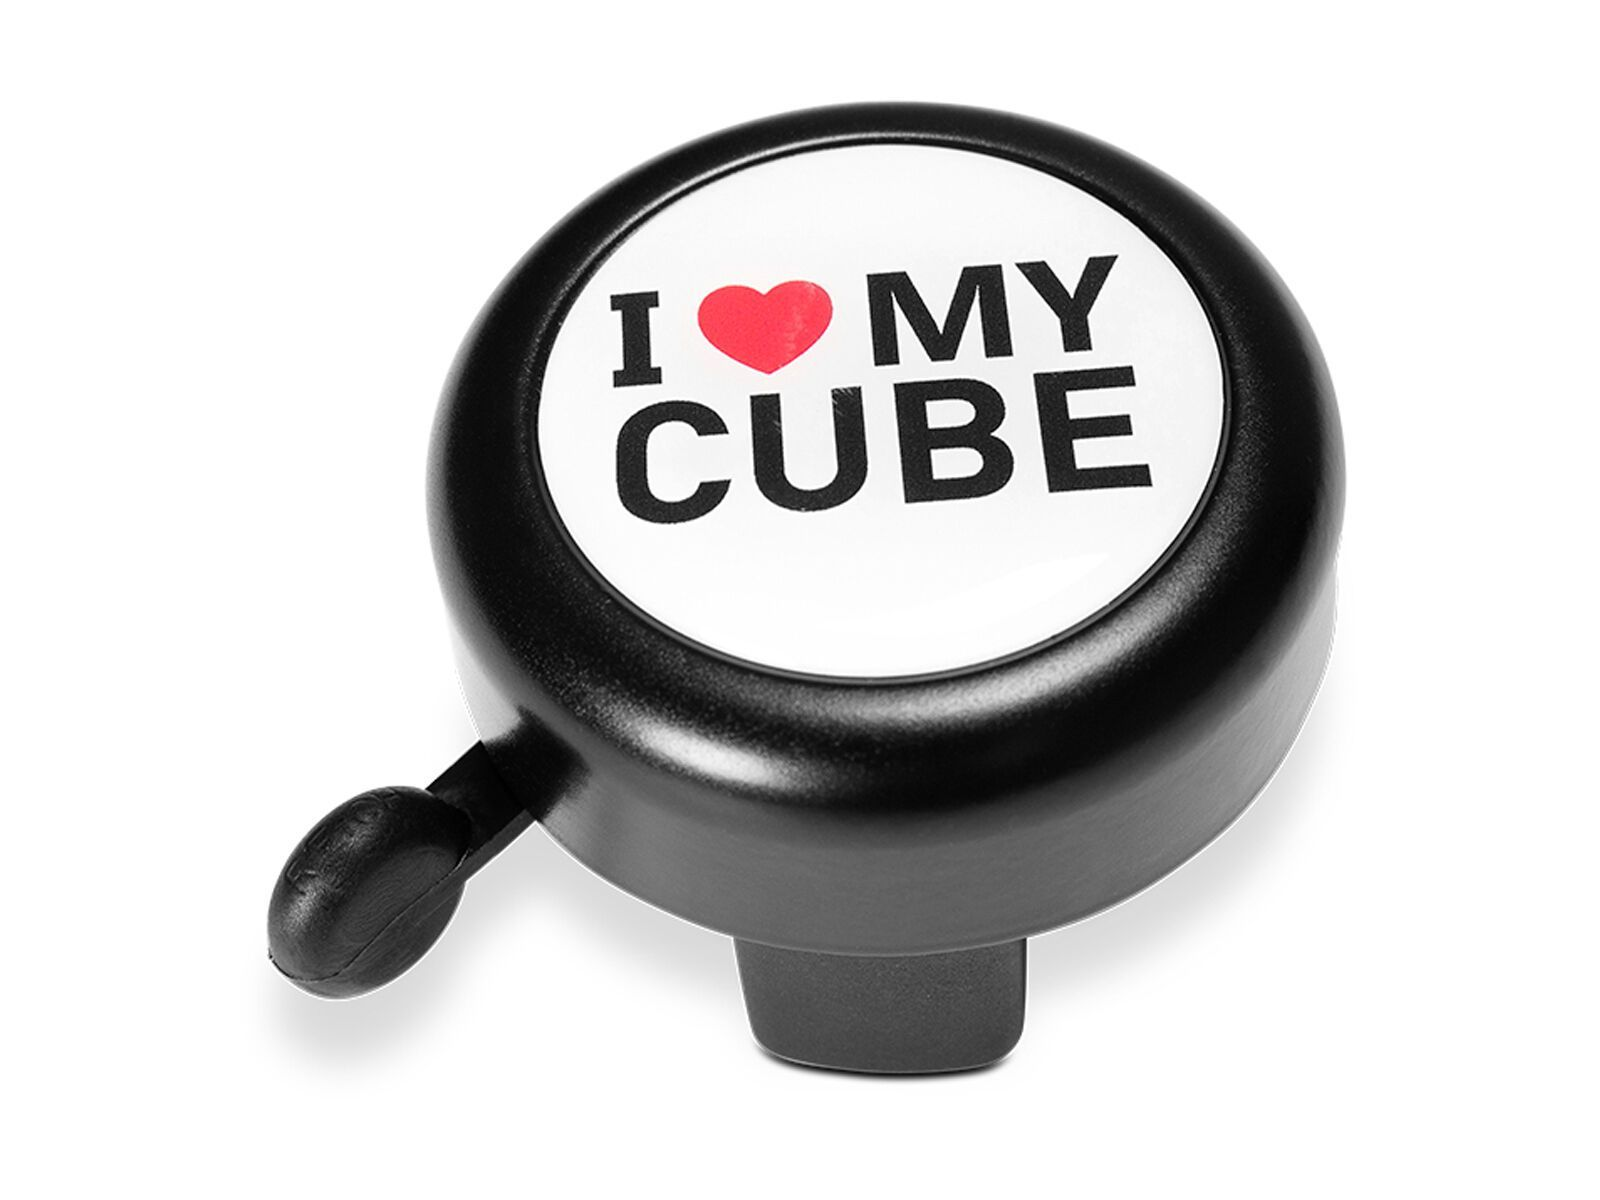 Cube Fahrradklingel I Love My Cube, black´n´white´n´red 150860000